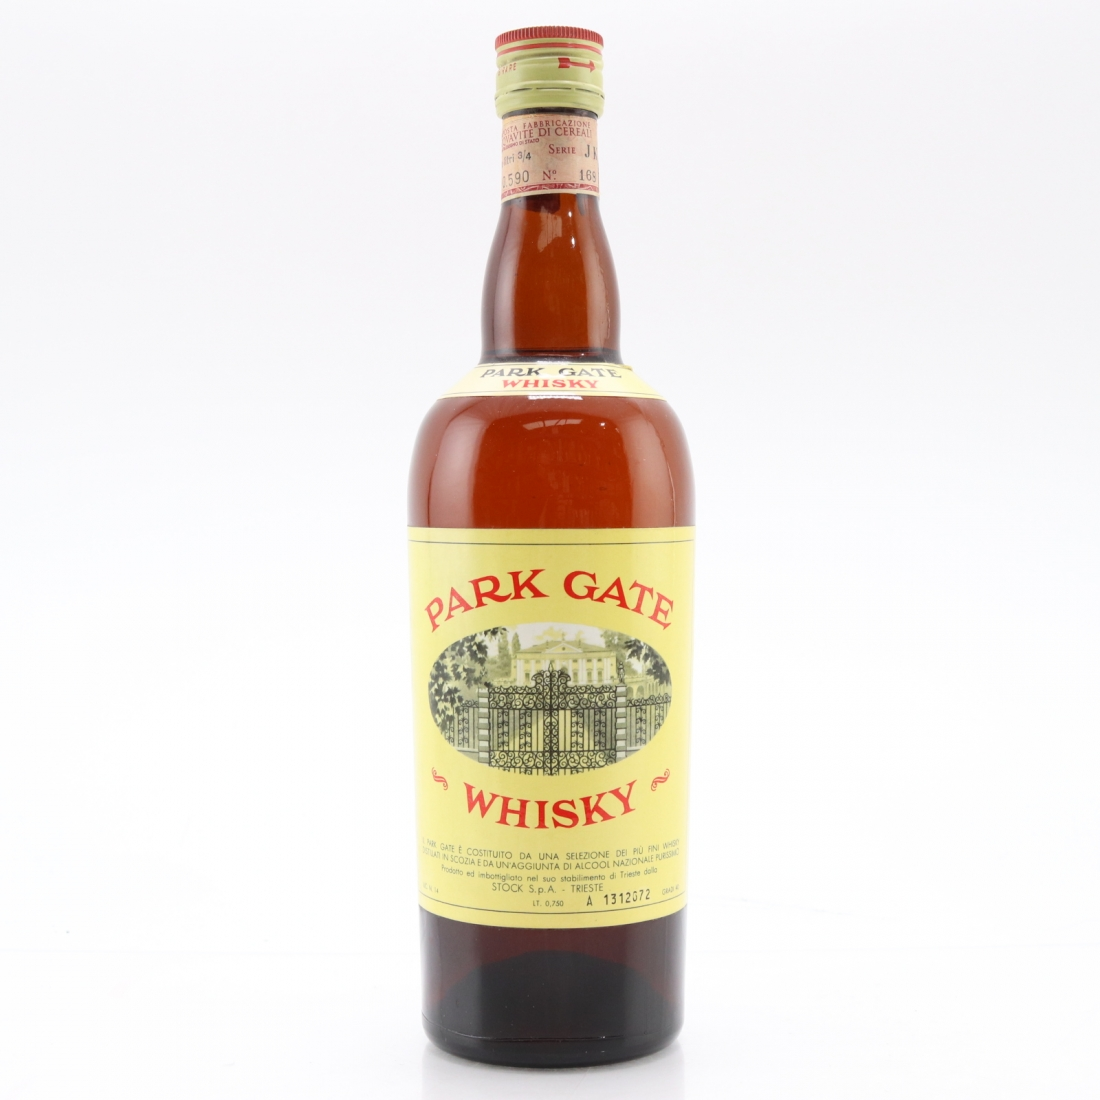 Park Gate Whisky circa 1960s